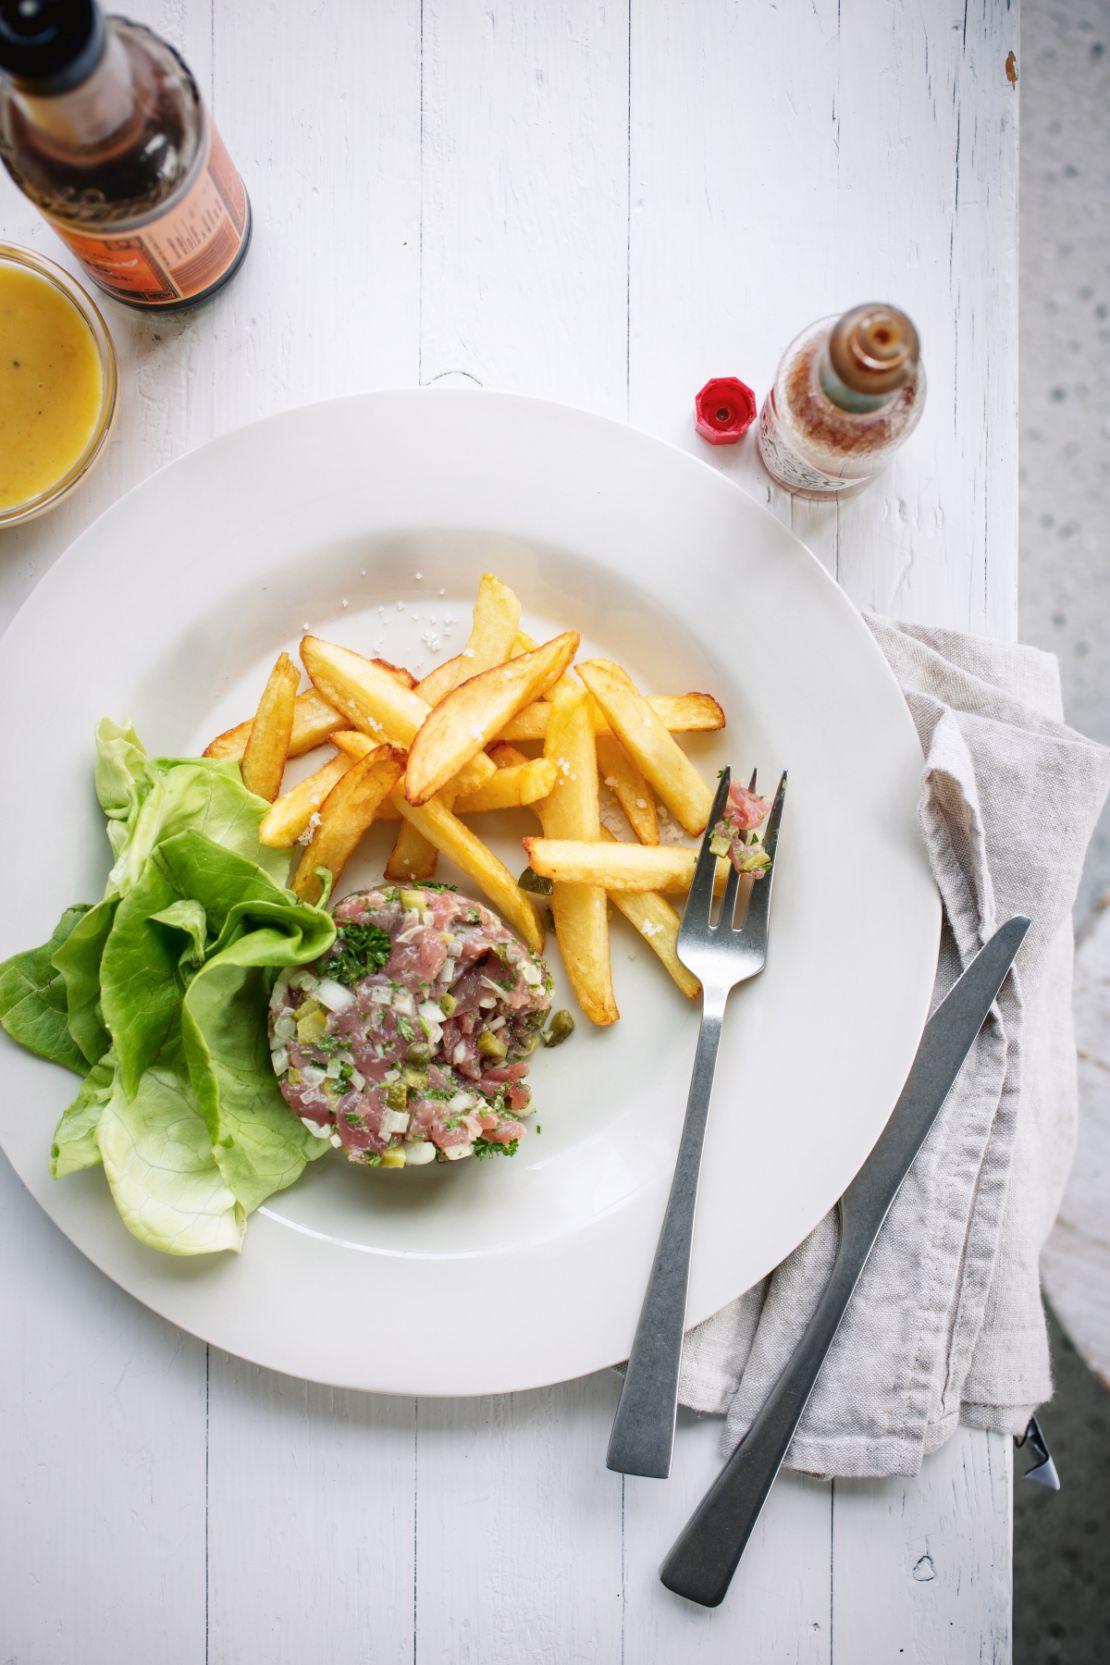 americain-prepare-met-frietjes